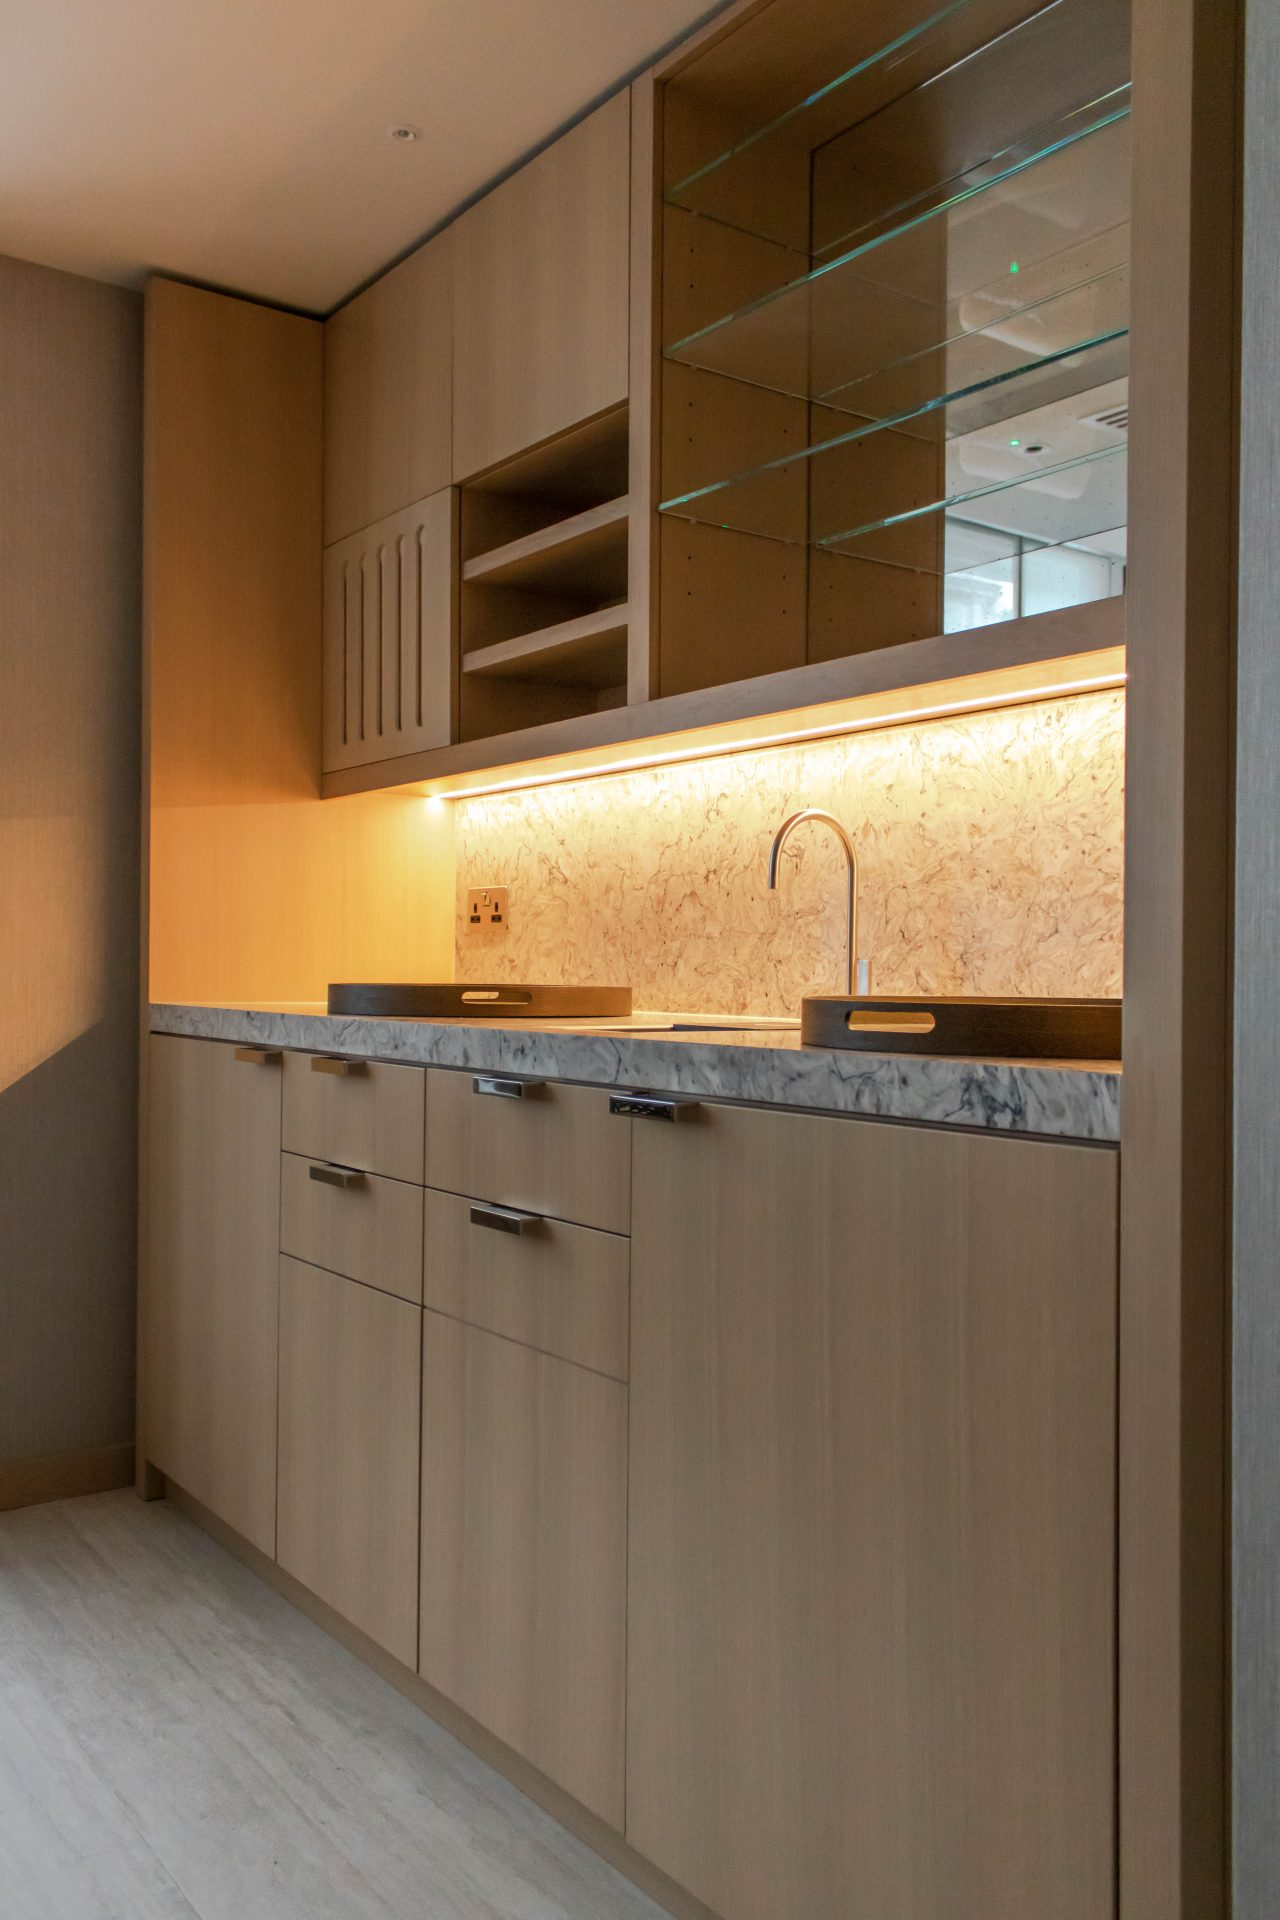 Kandd kitchen interior cabinetry